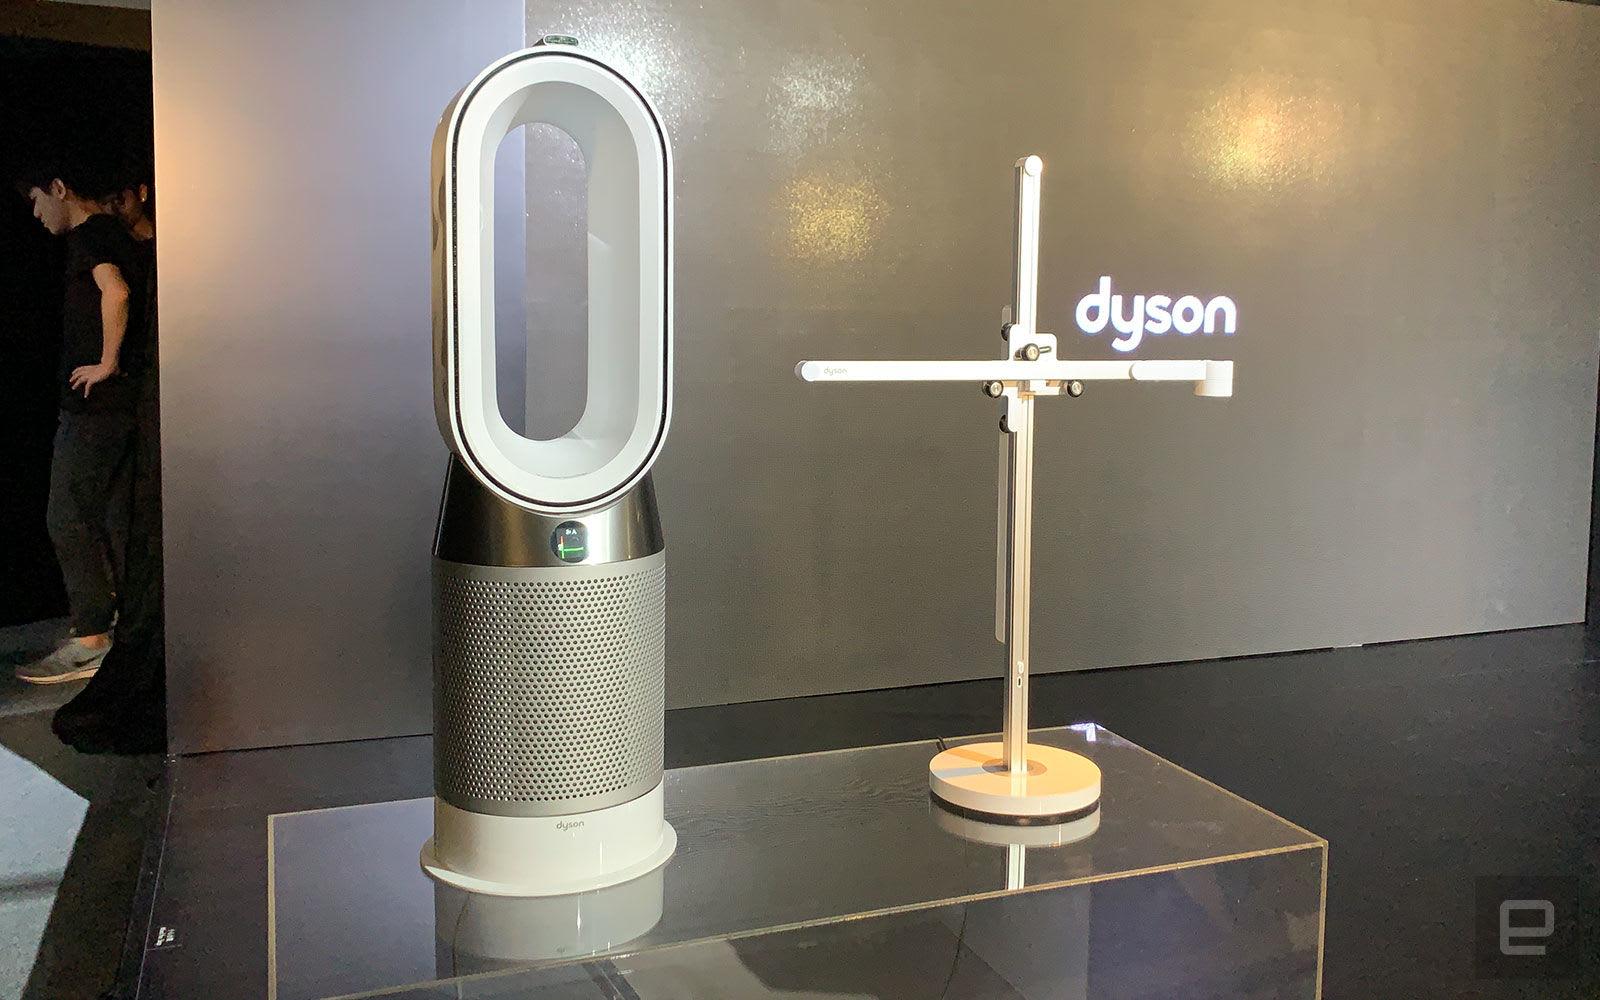 Dyson 首款燈具、升級版 Pure Hot+Cool 抵港開賣